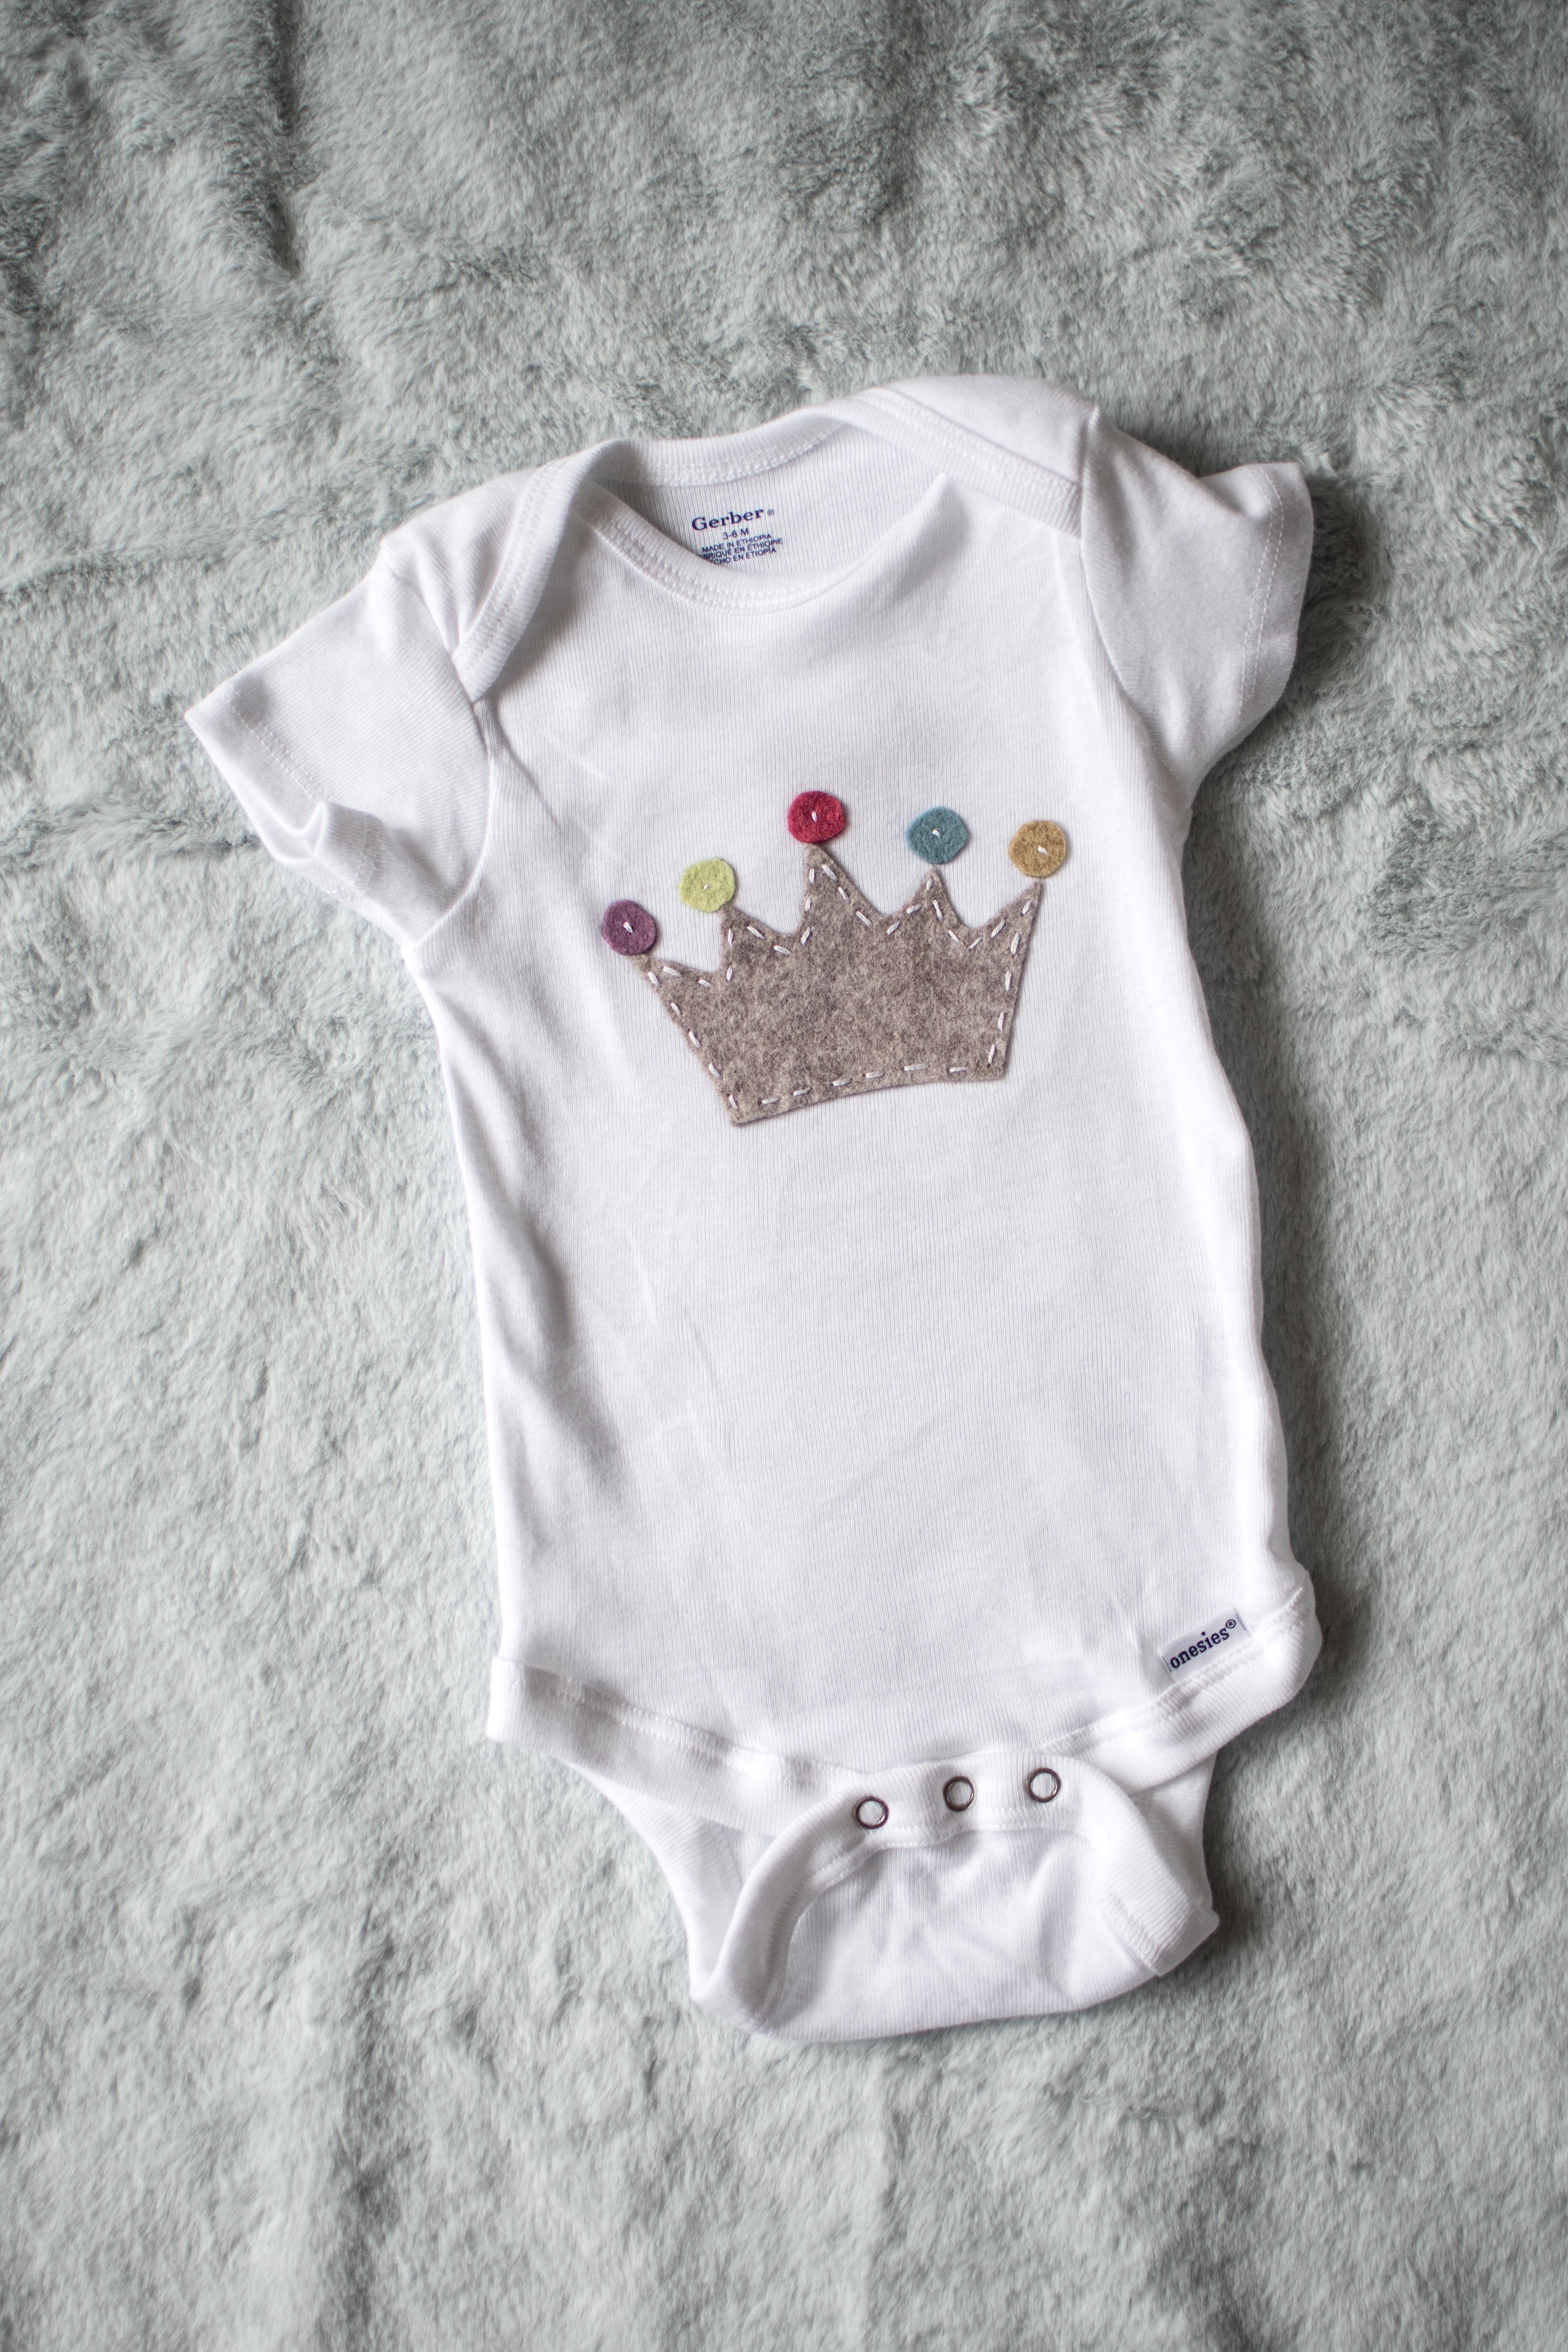 esie Baby Girl Princess Tiara Handmade Baby Clothes Every